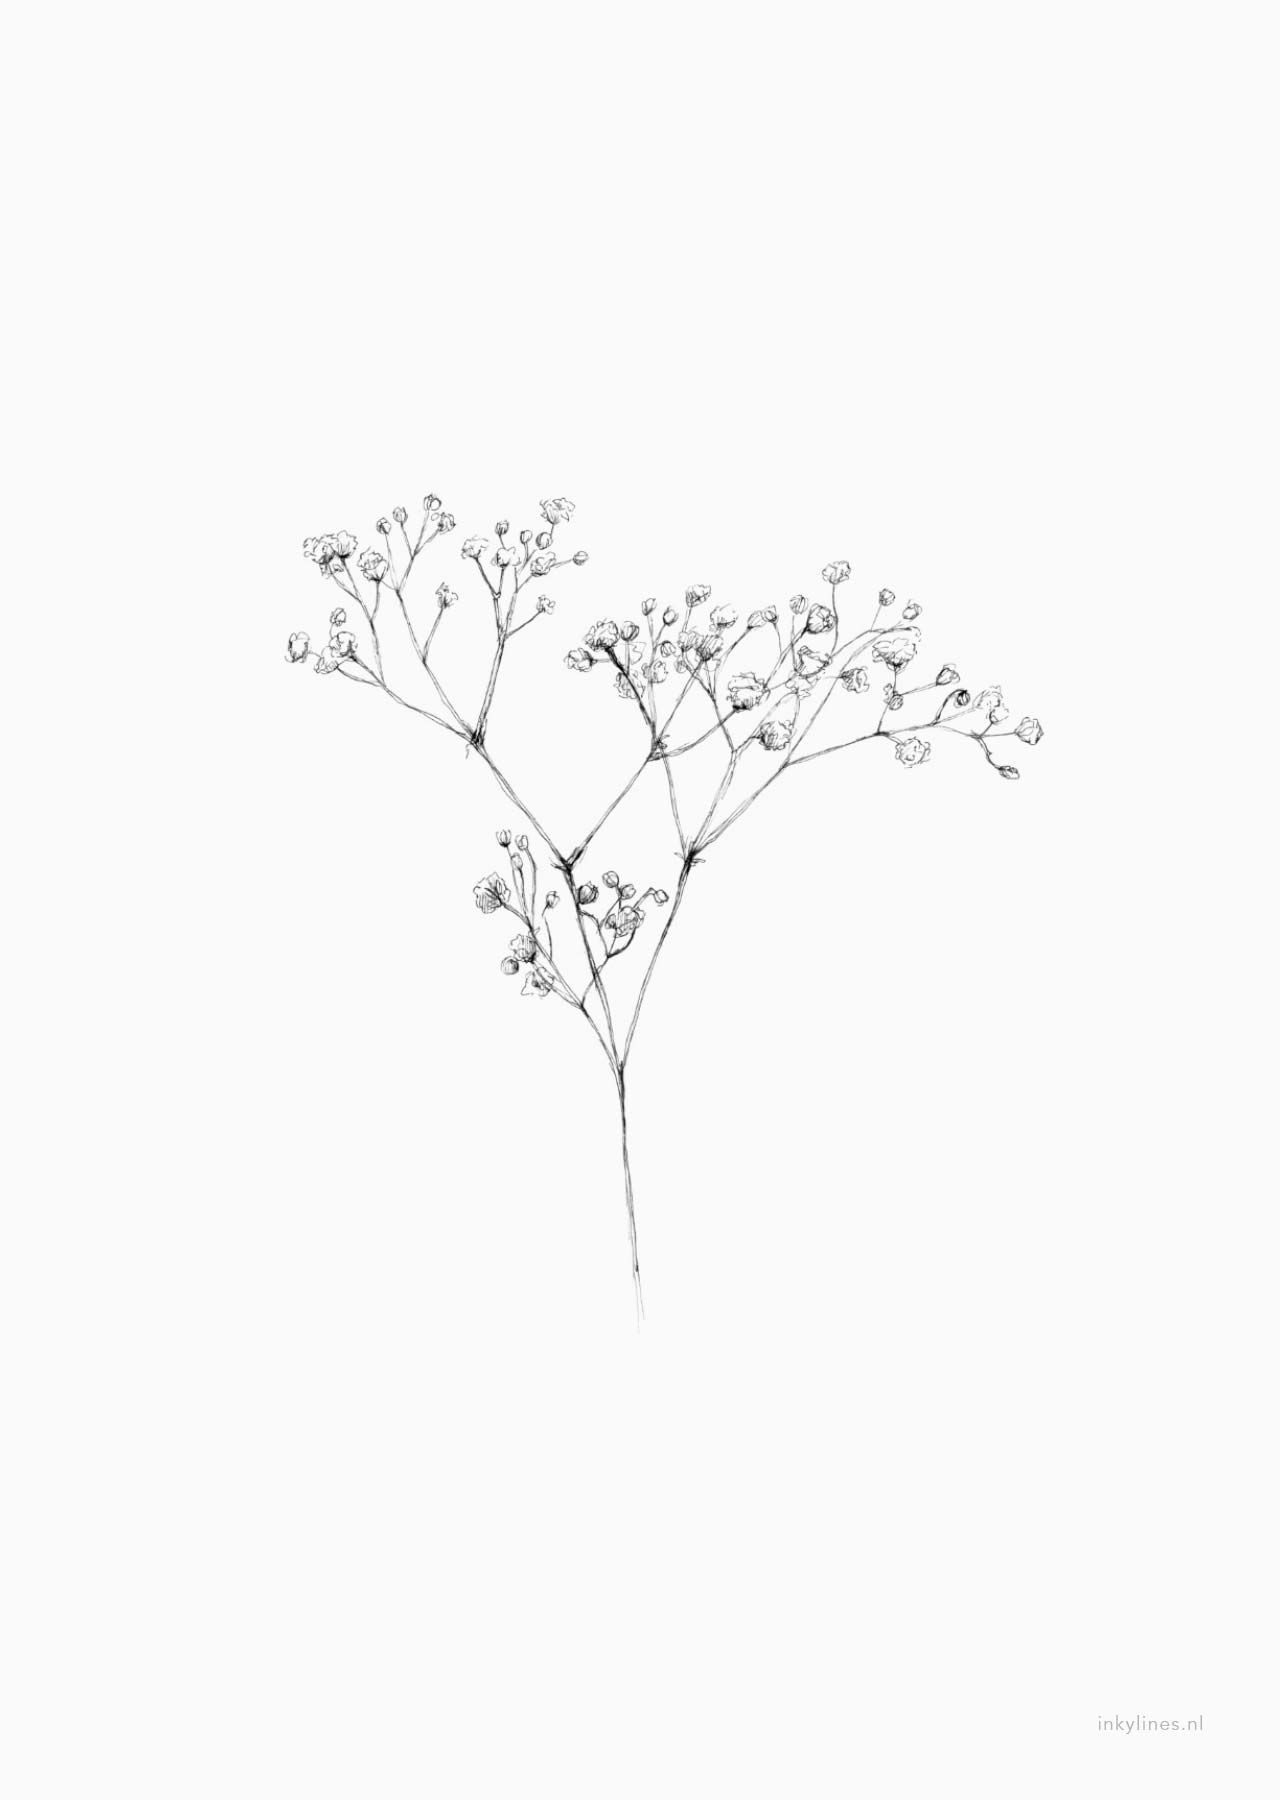 Flowers Gypsophila In 2020 Baby Breath Tattoo Wildflower Tattoo Gypsophila Tattoo